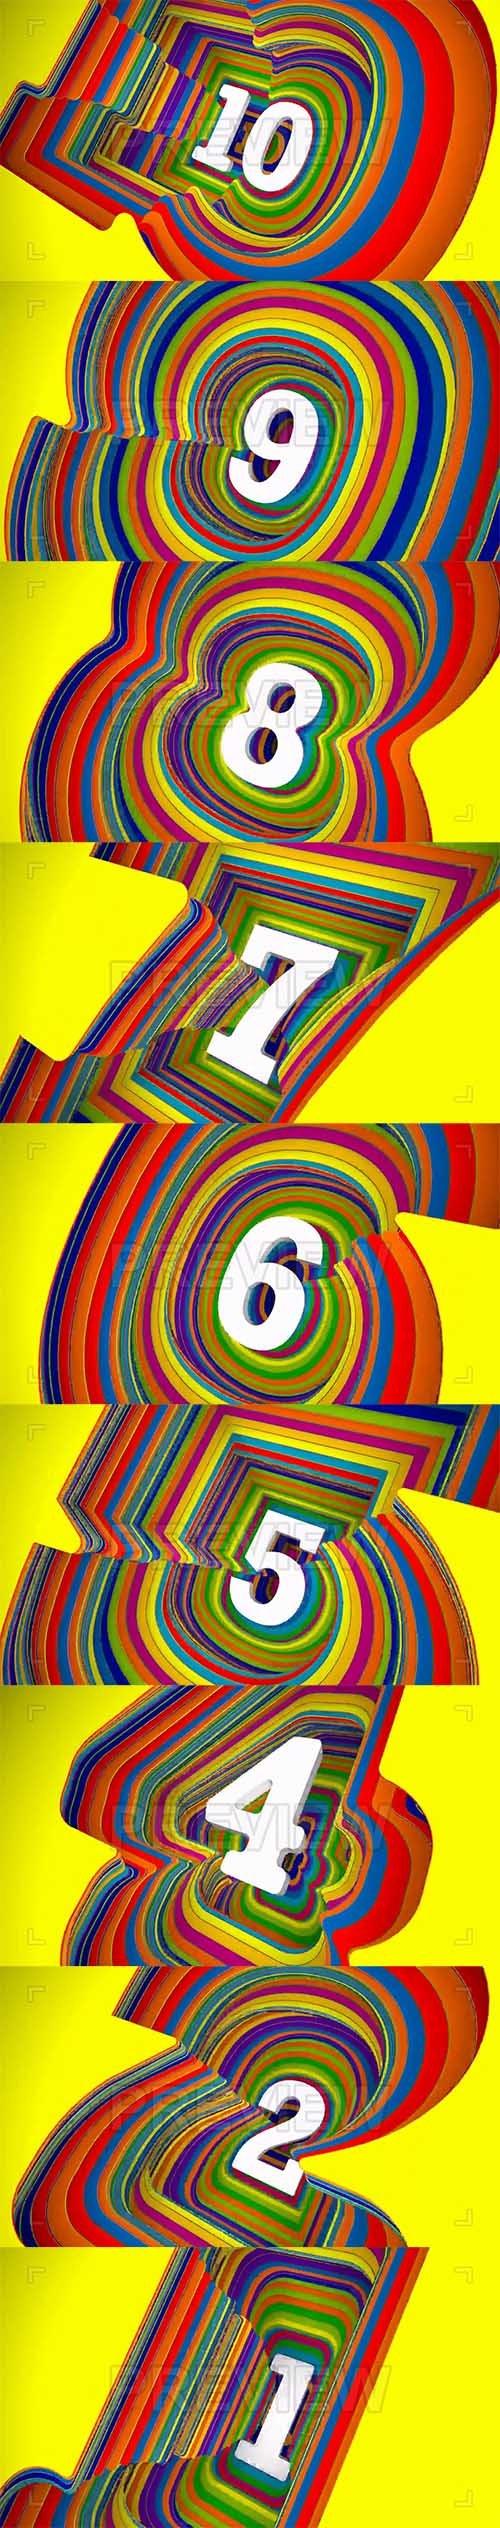 MA - Colorful Countdown 54563